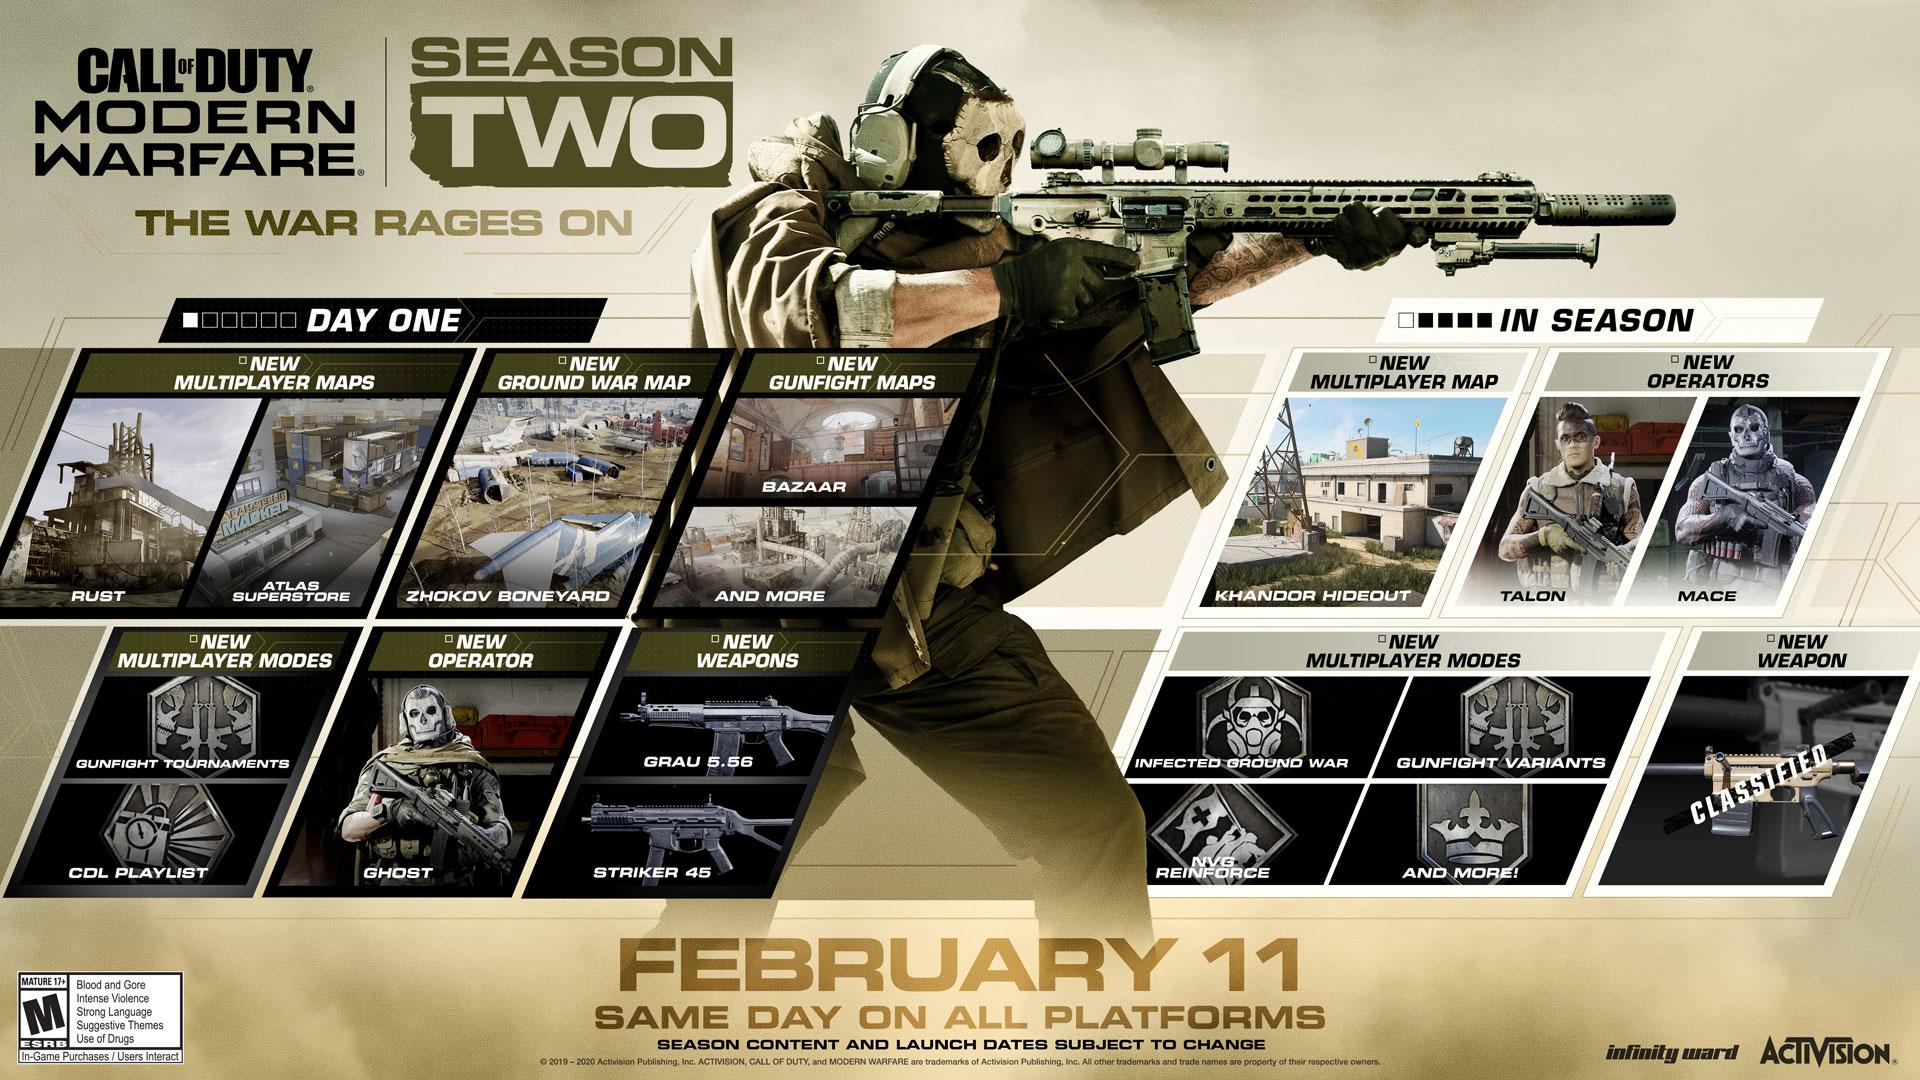 Call Of Duty Modern Warfare Season 2 Trailer Release Date And